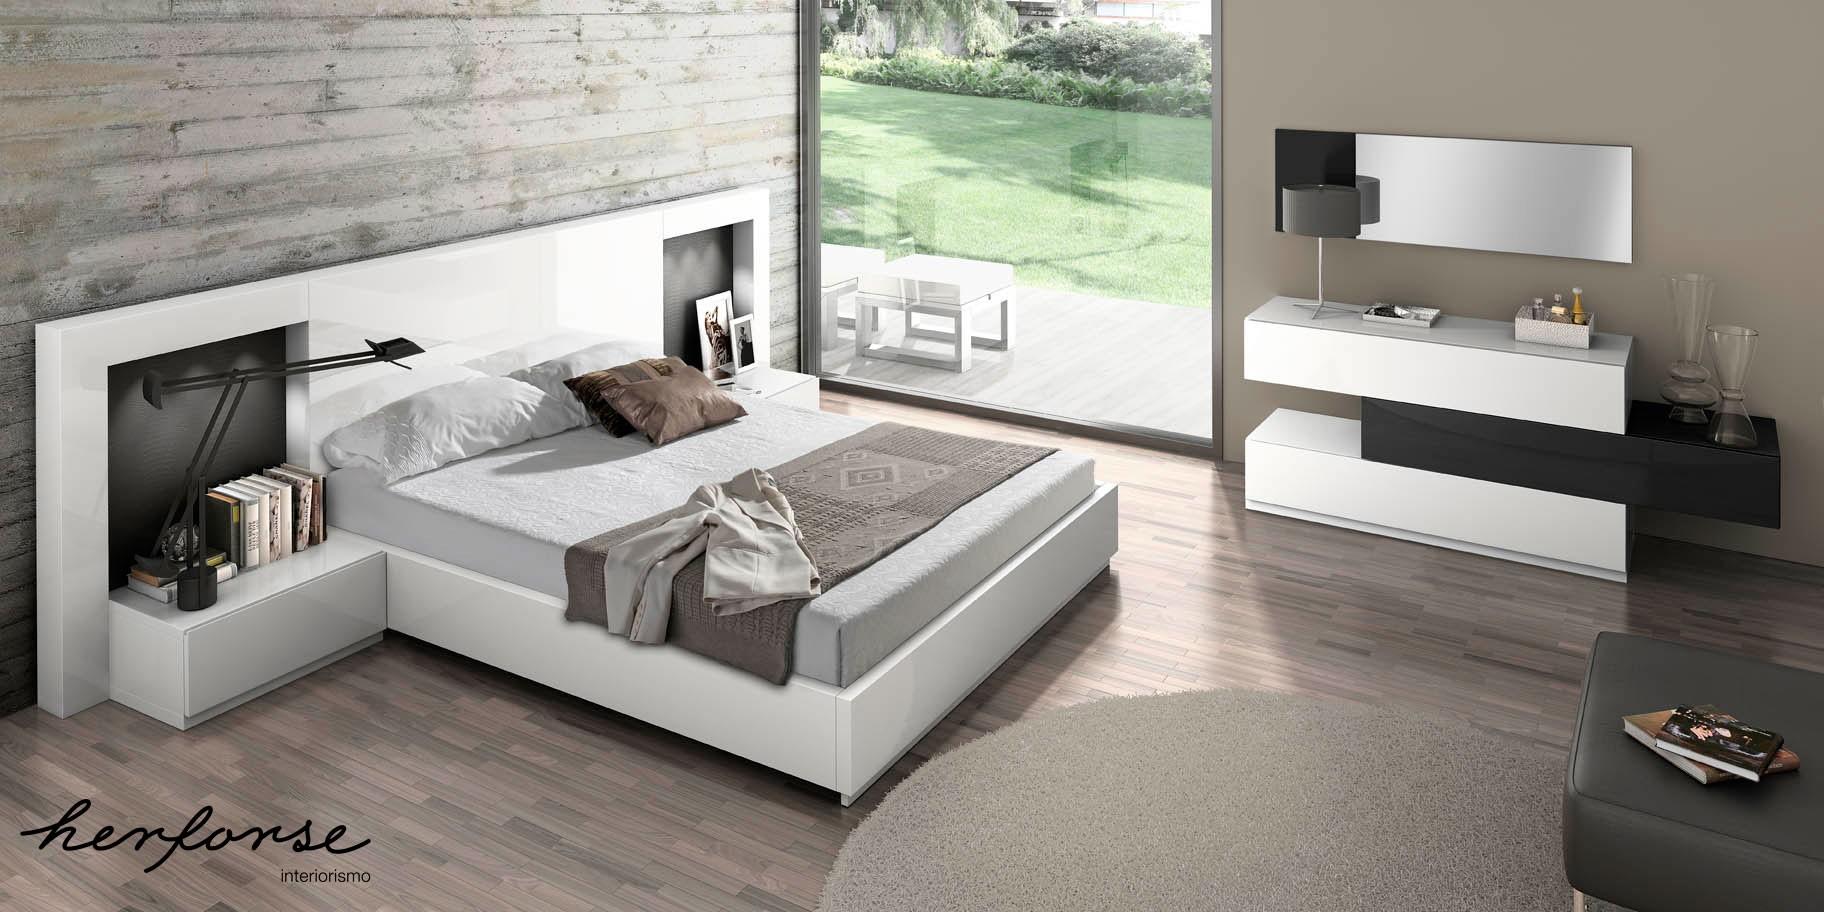 Modernos vanguardia dormitorios herforseinteriorismo - Dormitorios madera modernos ...